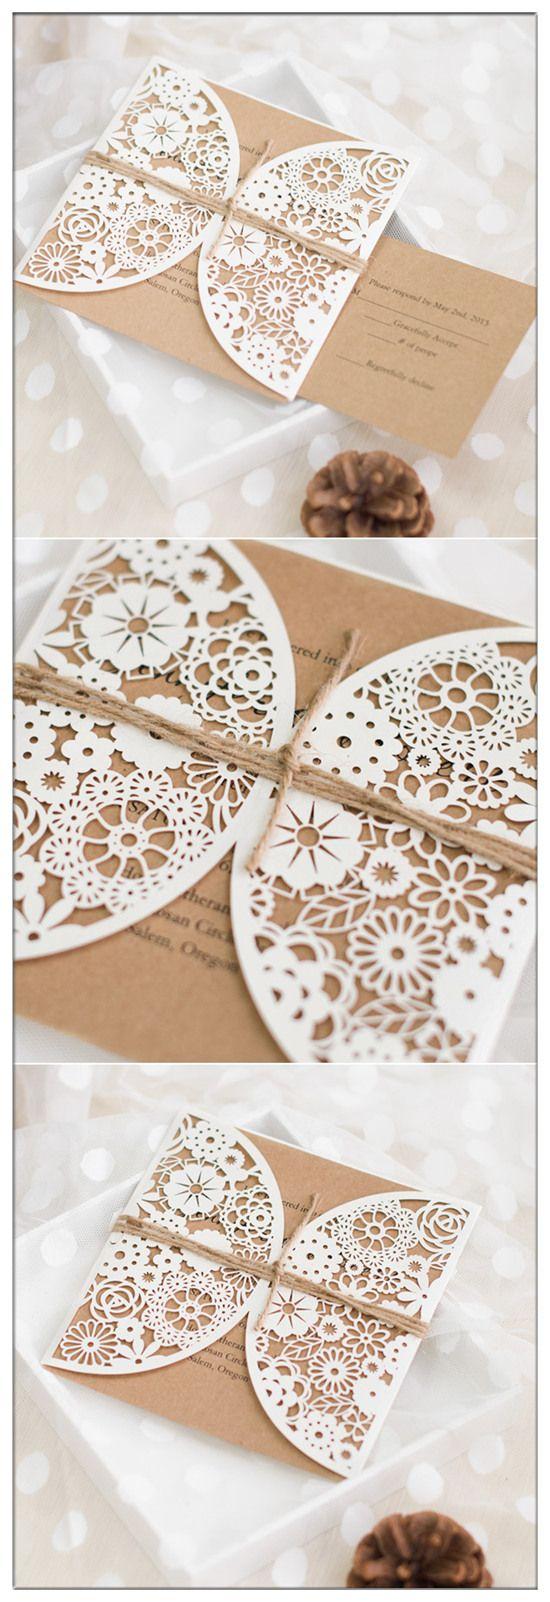 laser cut pocket chic  rustic wedding invitations with burlap